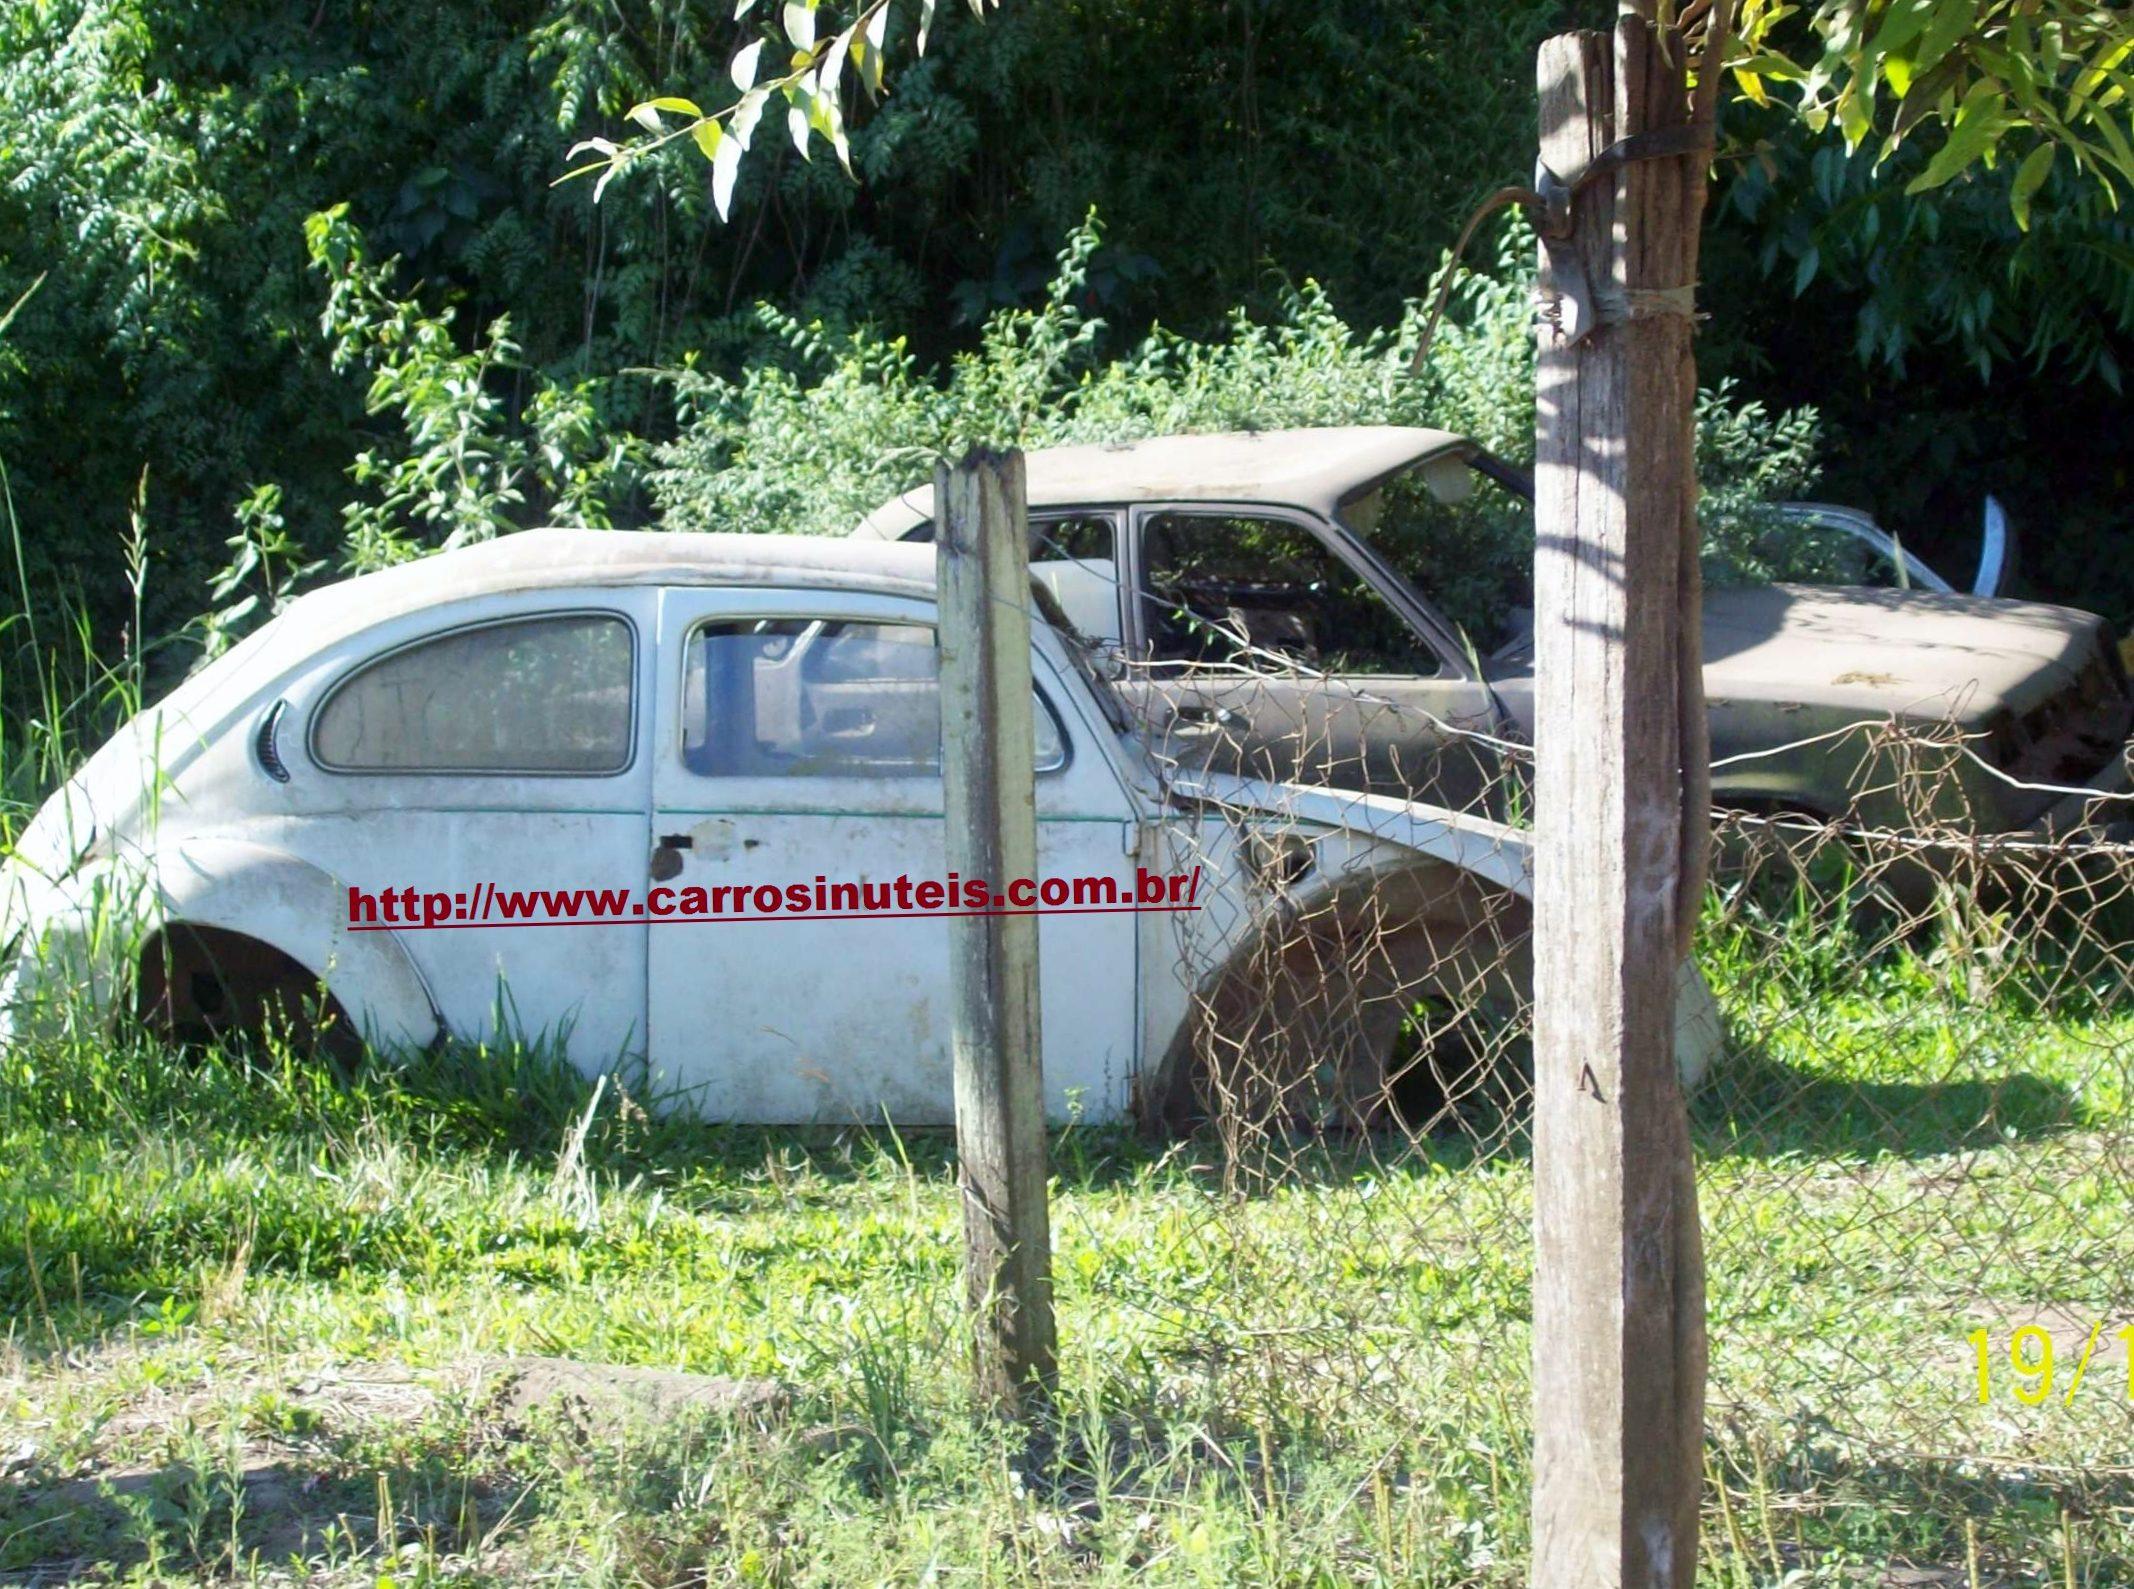 MarceloKTChevette4portas-Roca-Sales-RS-2 Volkswagen Fusca e Chevrolet Chevette 4 portas